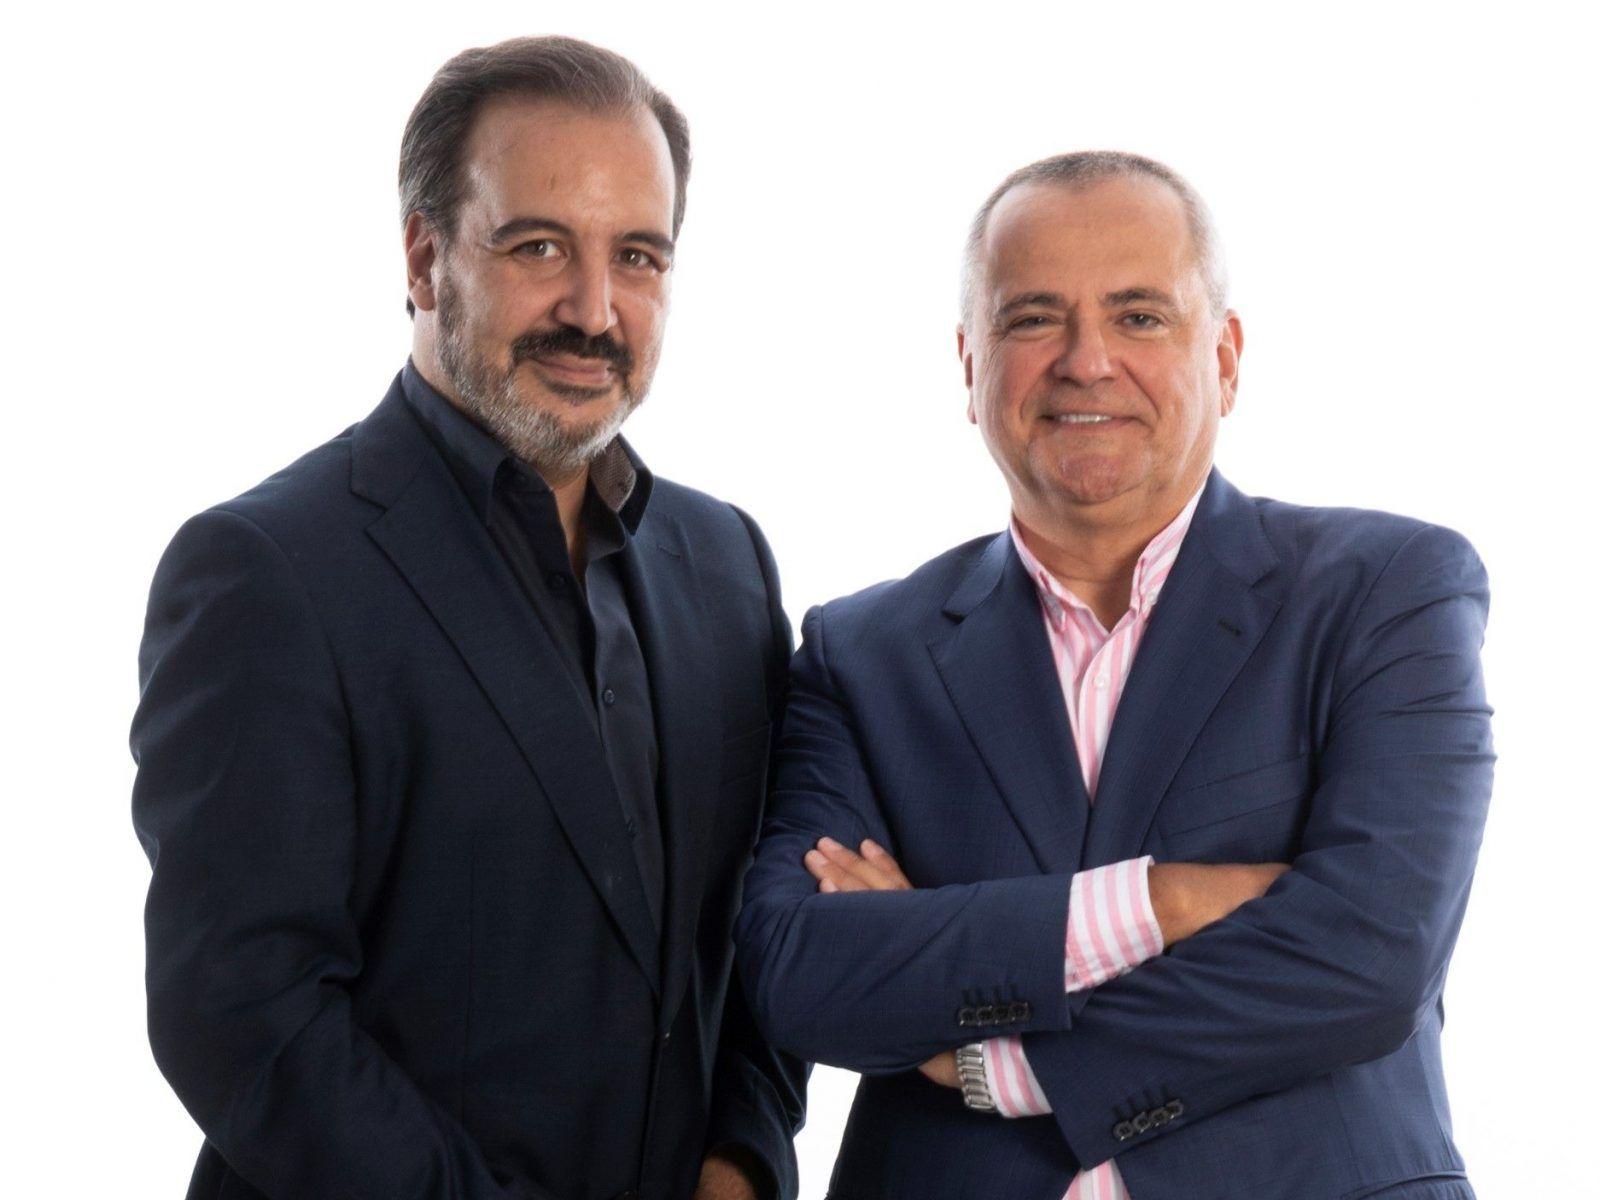 Miguel Ángel Pérez y Juanma Romero